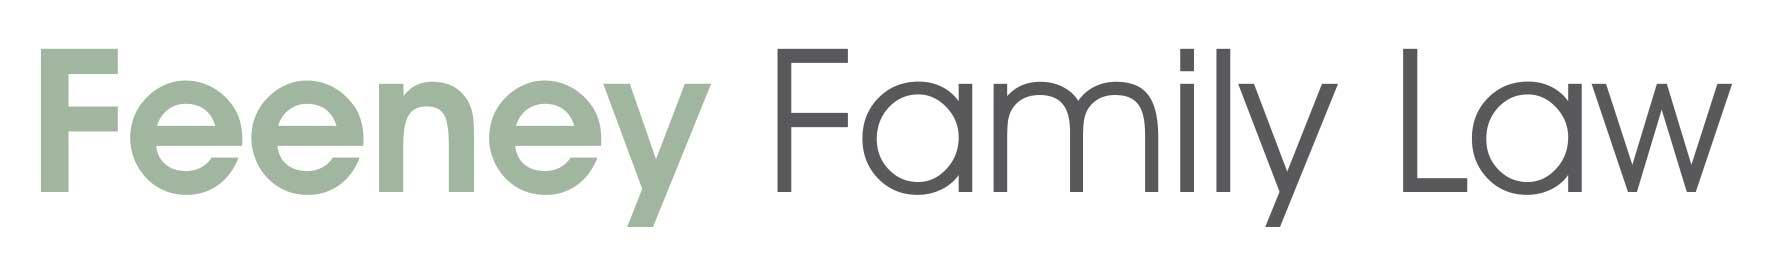 Feeney Family Law